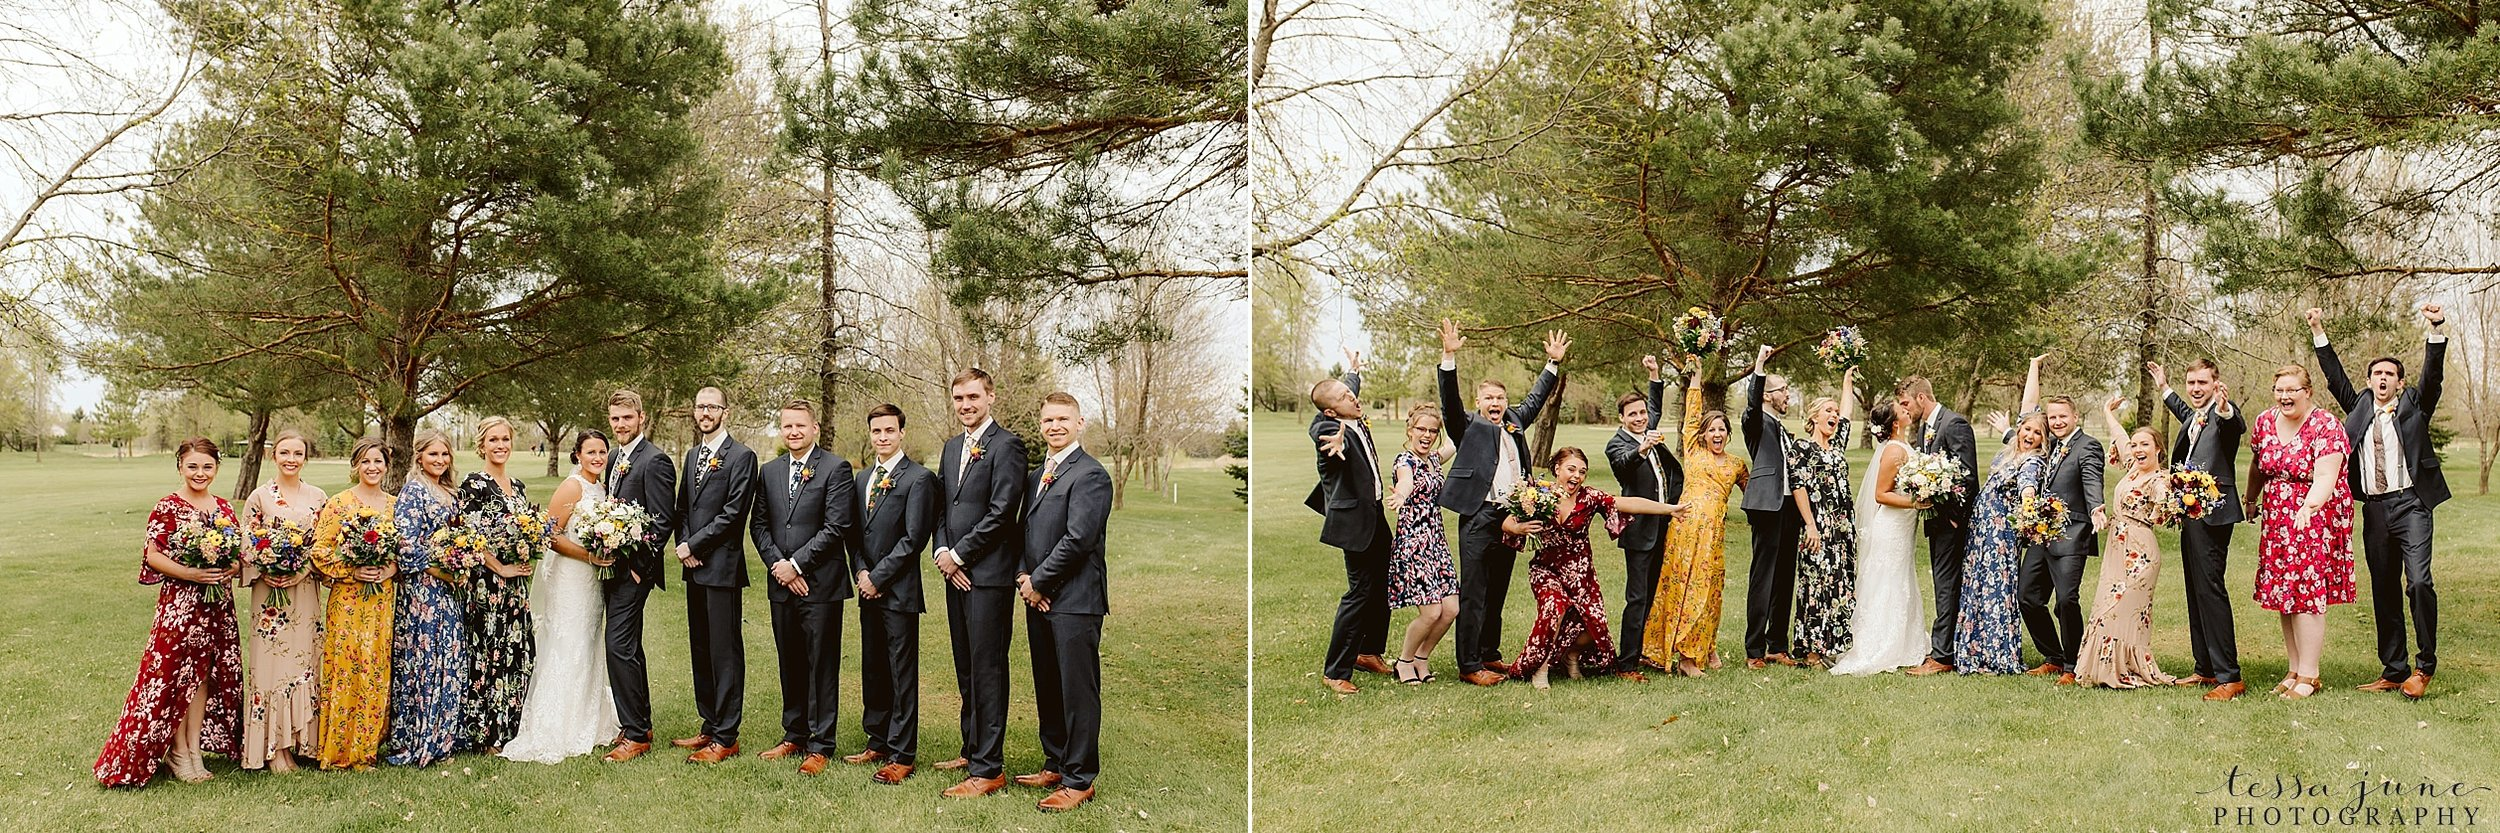 The-grands-at-mulligans-wedding-sartell-minnesota-spring-floral-spring-garden-wedding-68.jpg